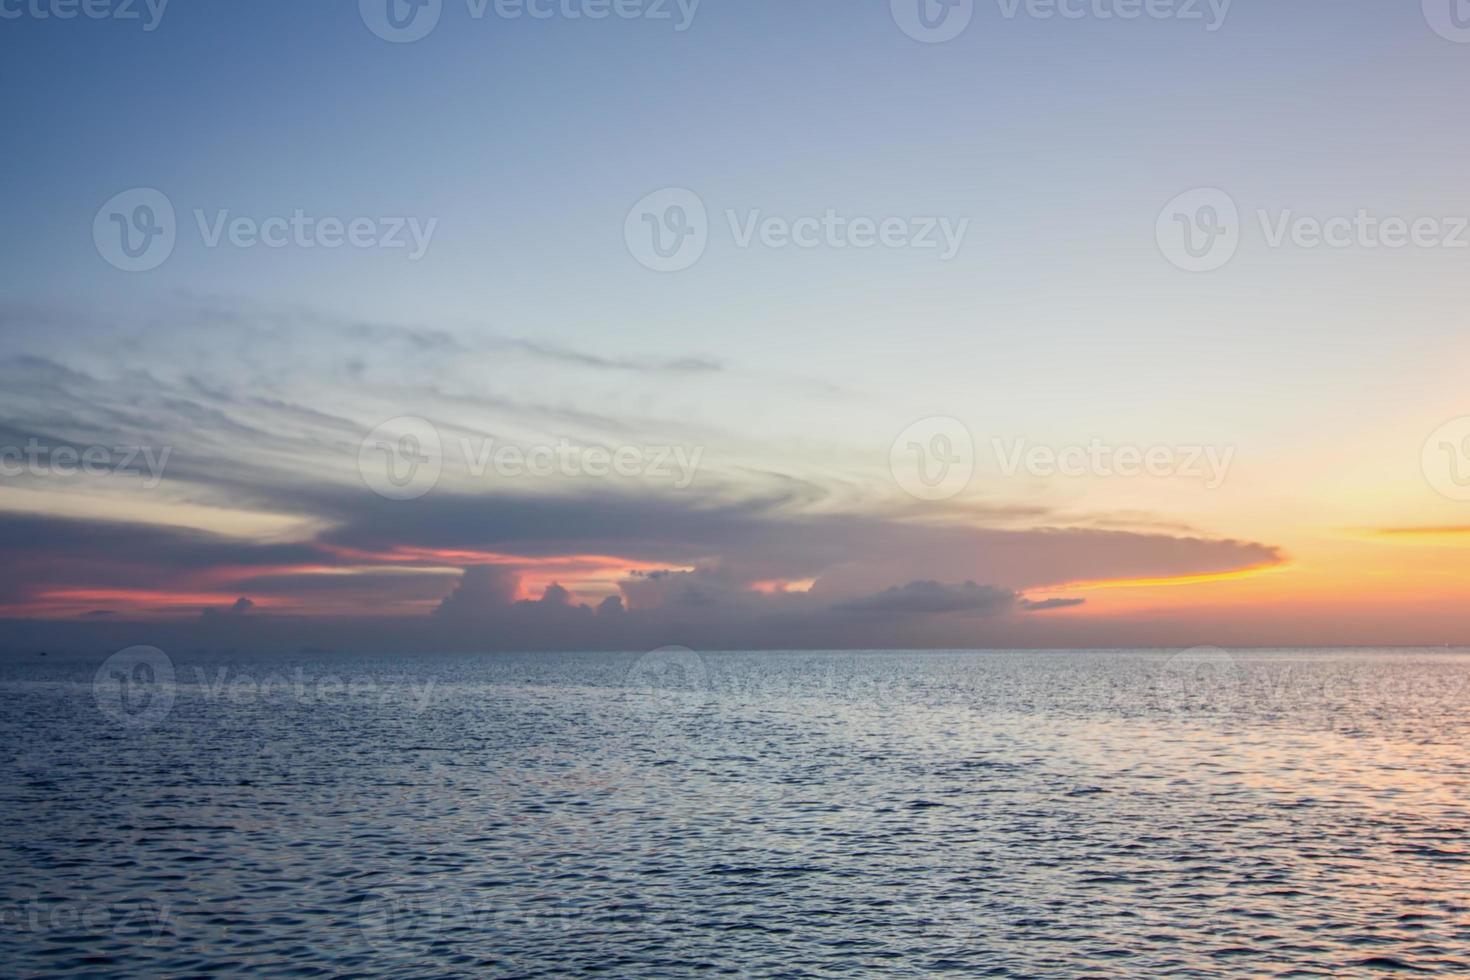 tramonto in mare, Koh Phangan, Surat Thani, Tailandia foto